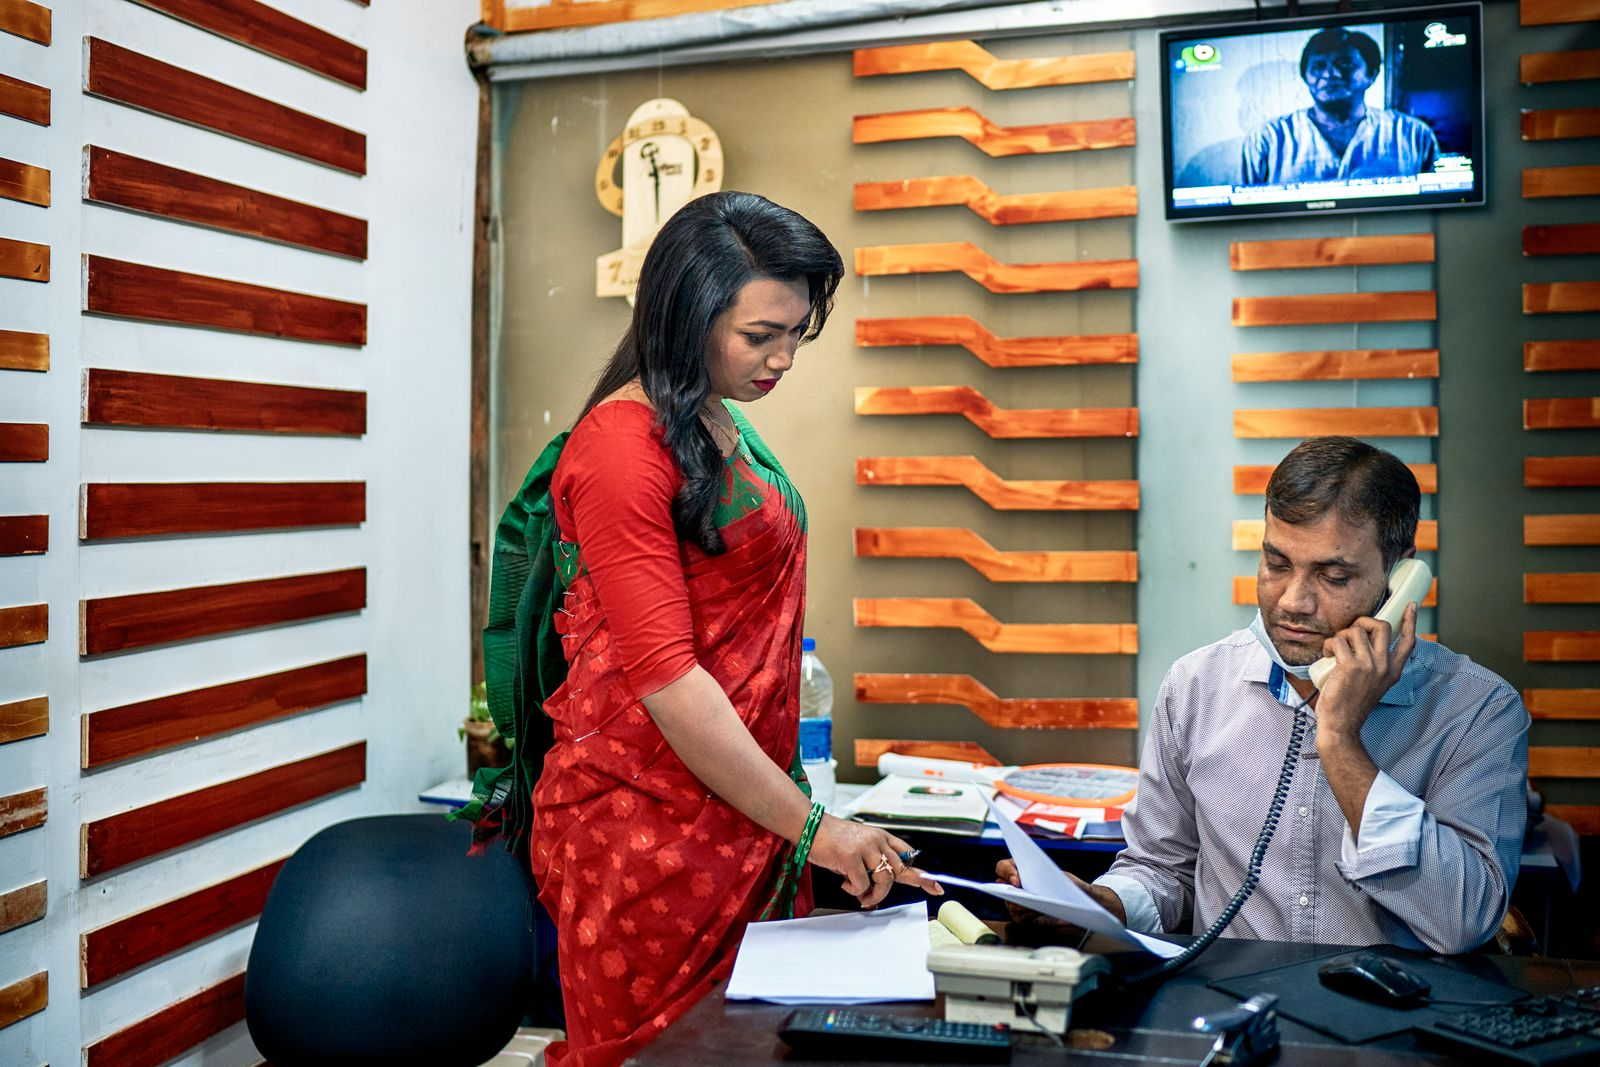 Tashnuva Anan Shishir, left, confers with a colleague at the Boishakhi TV studio in Dhaka, Bangladesh, on Saturday, March 13, 2021. (Fabeha Monir/The New York Times)